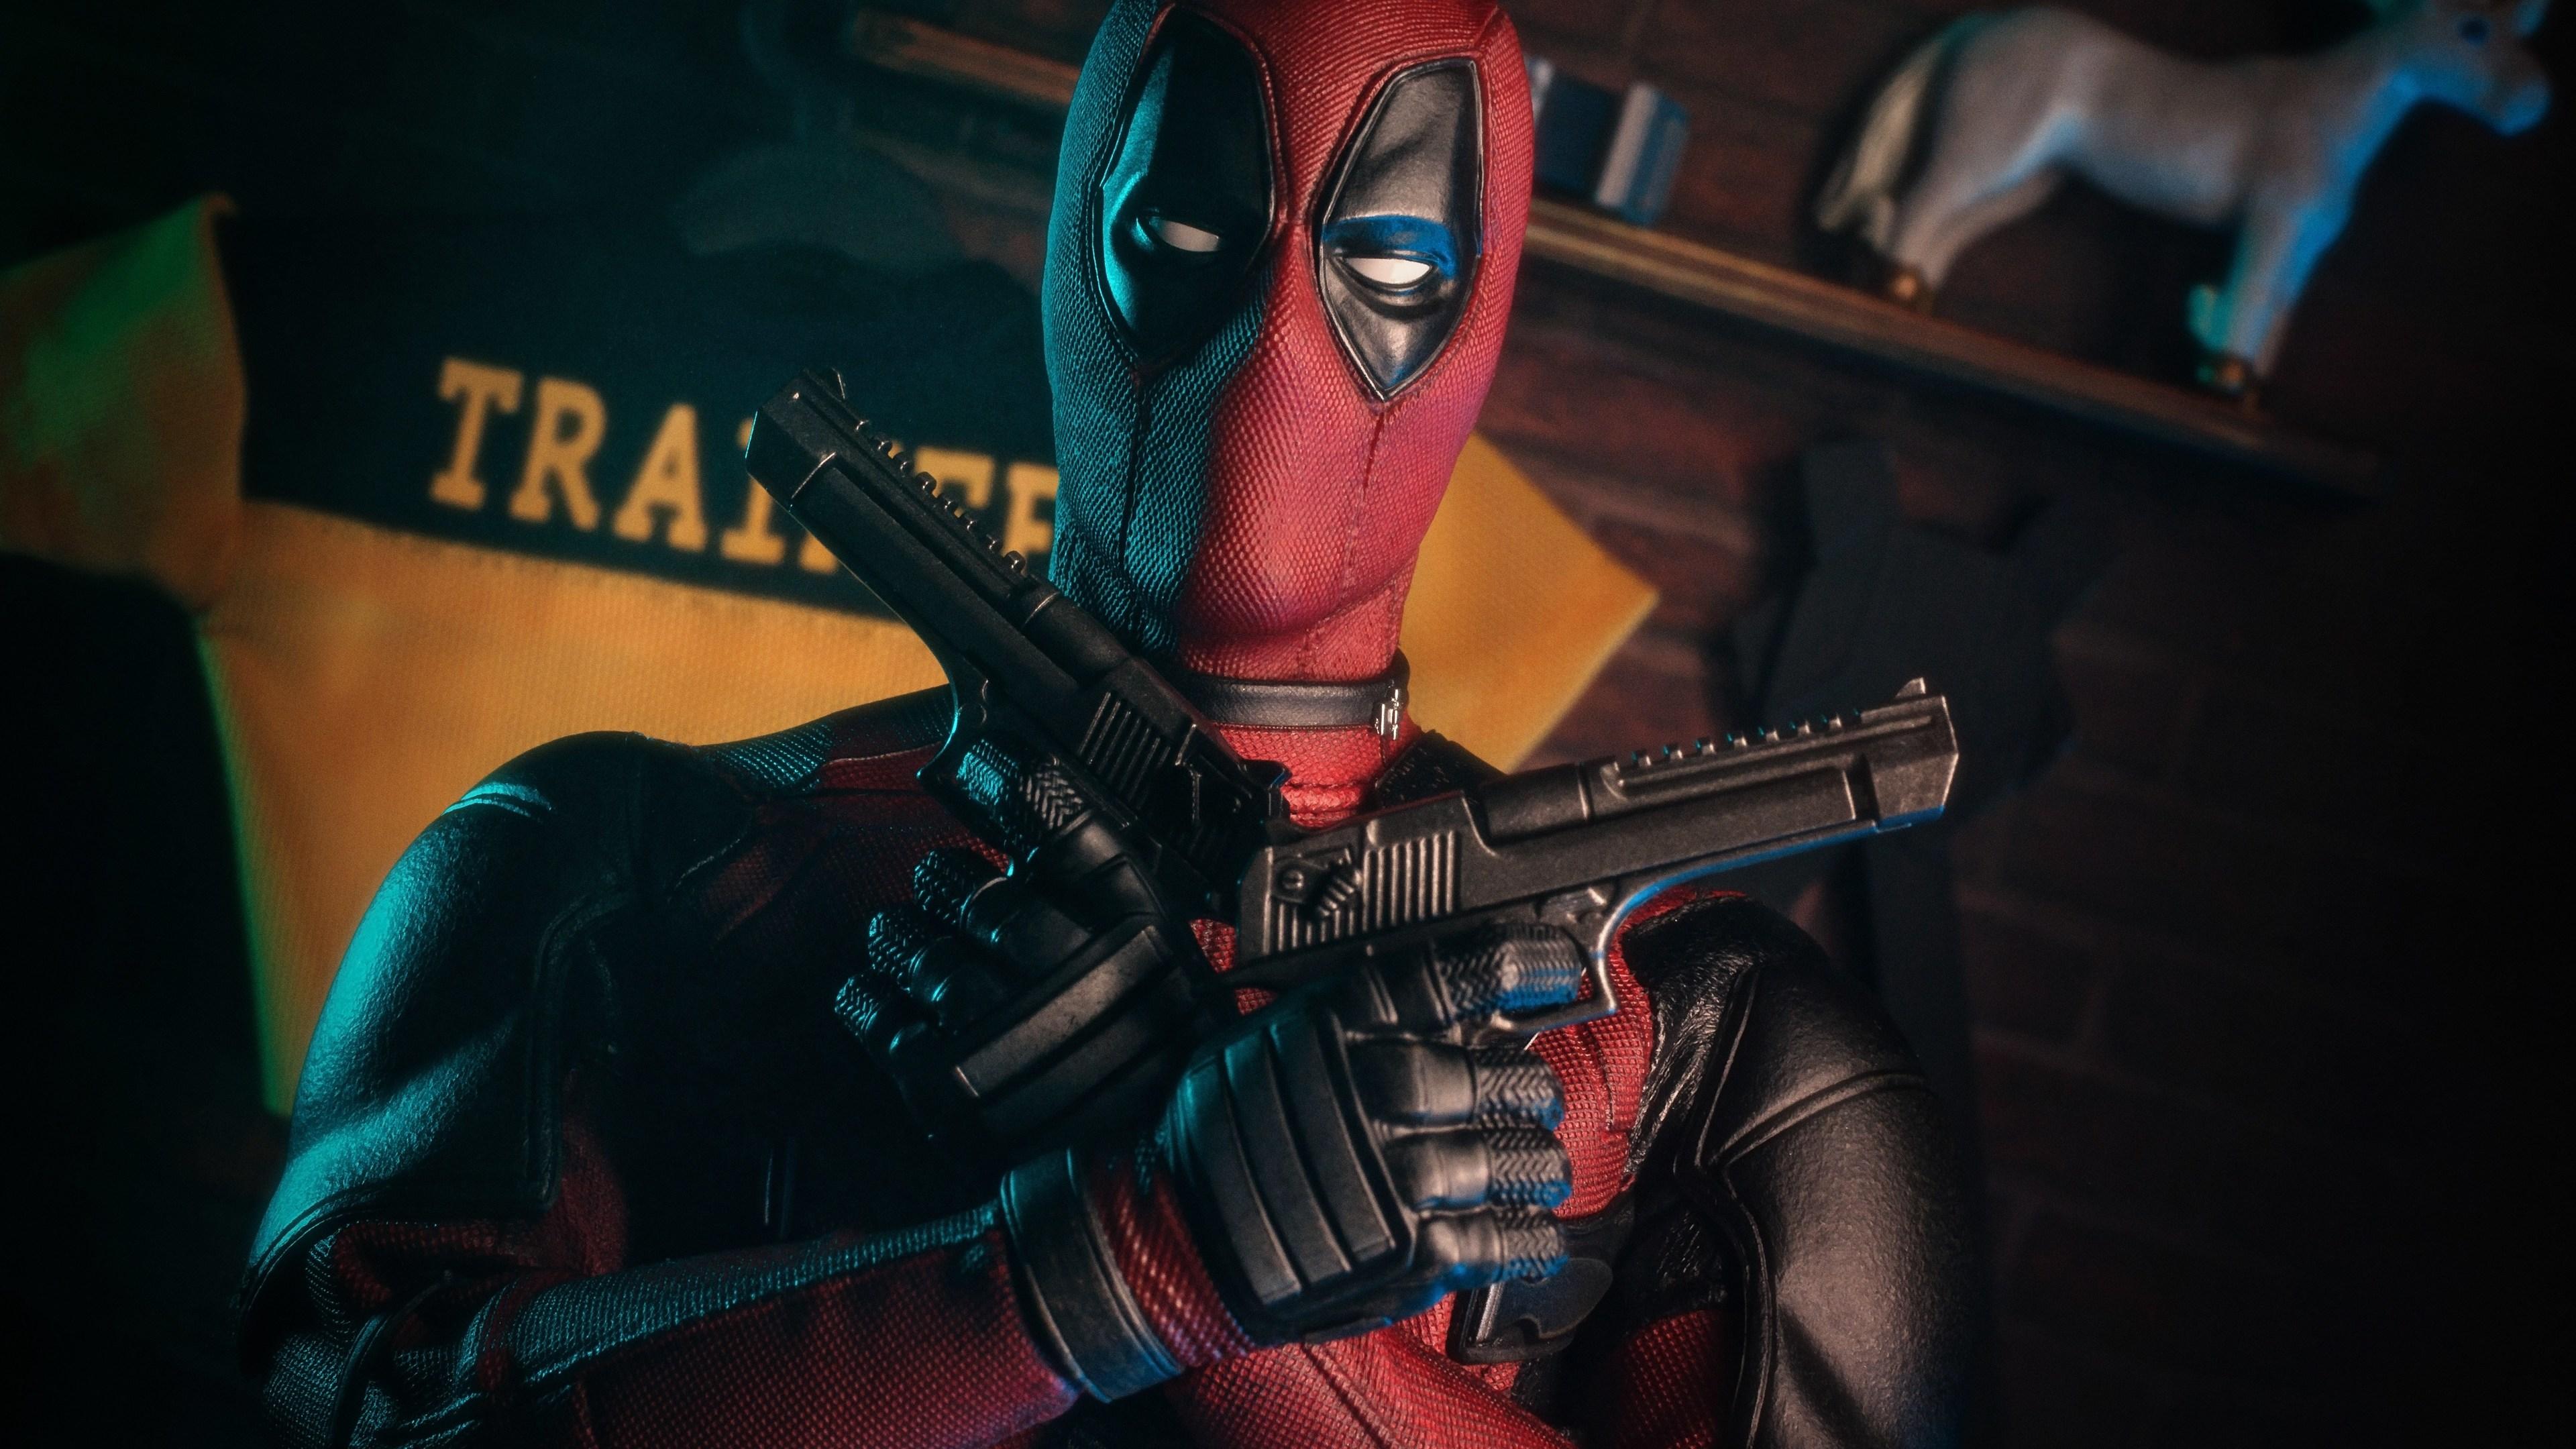 deadpool with guns 4k 1547936608 - Deadpool With Guns 4k - superheroes wallpapers, hd-wallpapers, deadpool wallpapers, 5k wallpapers, 4k-wallpapers